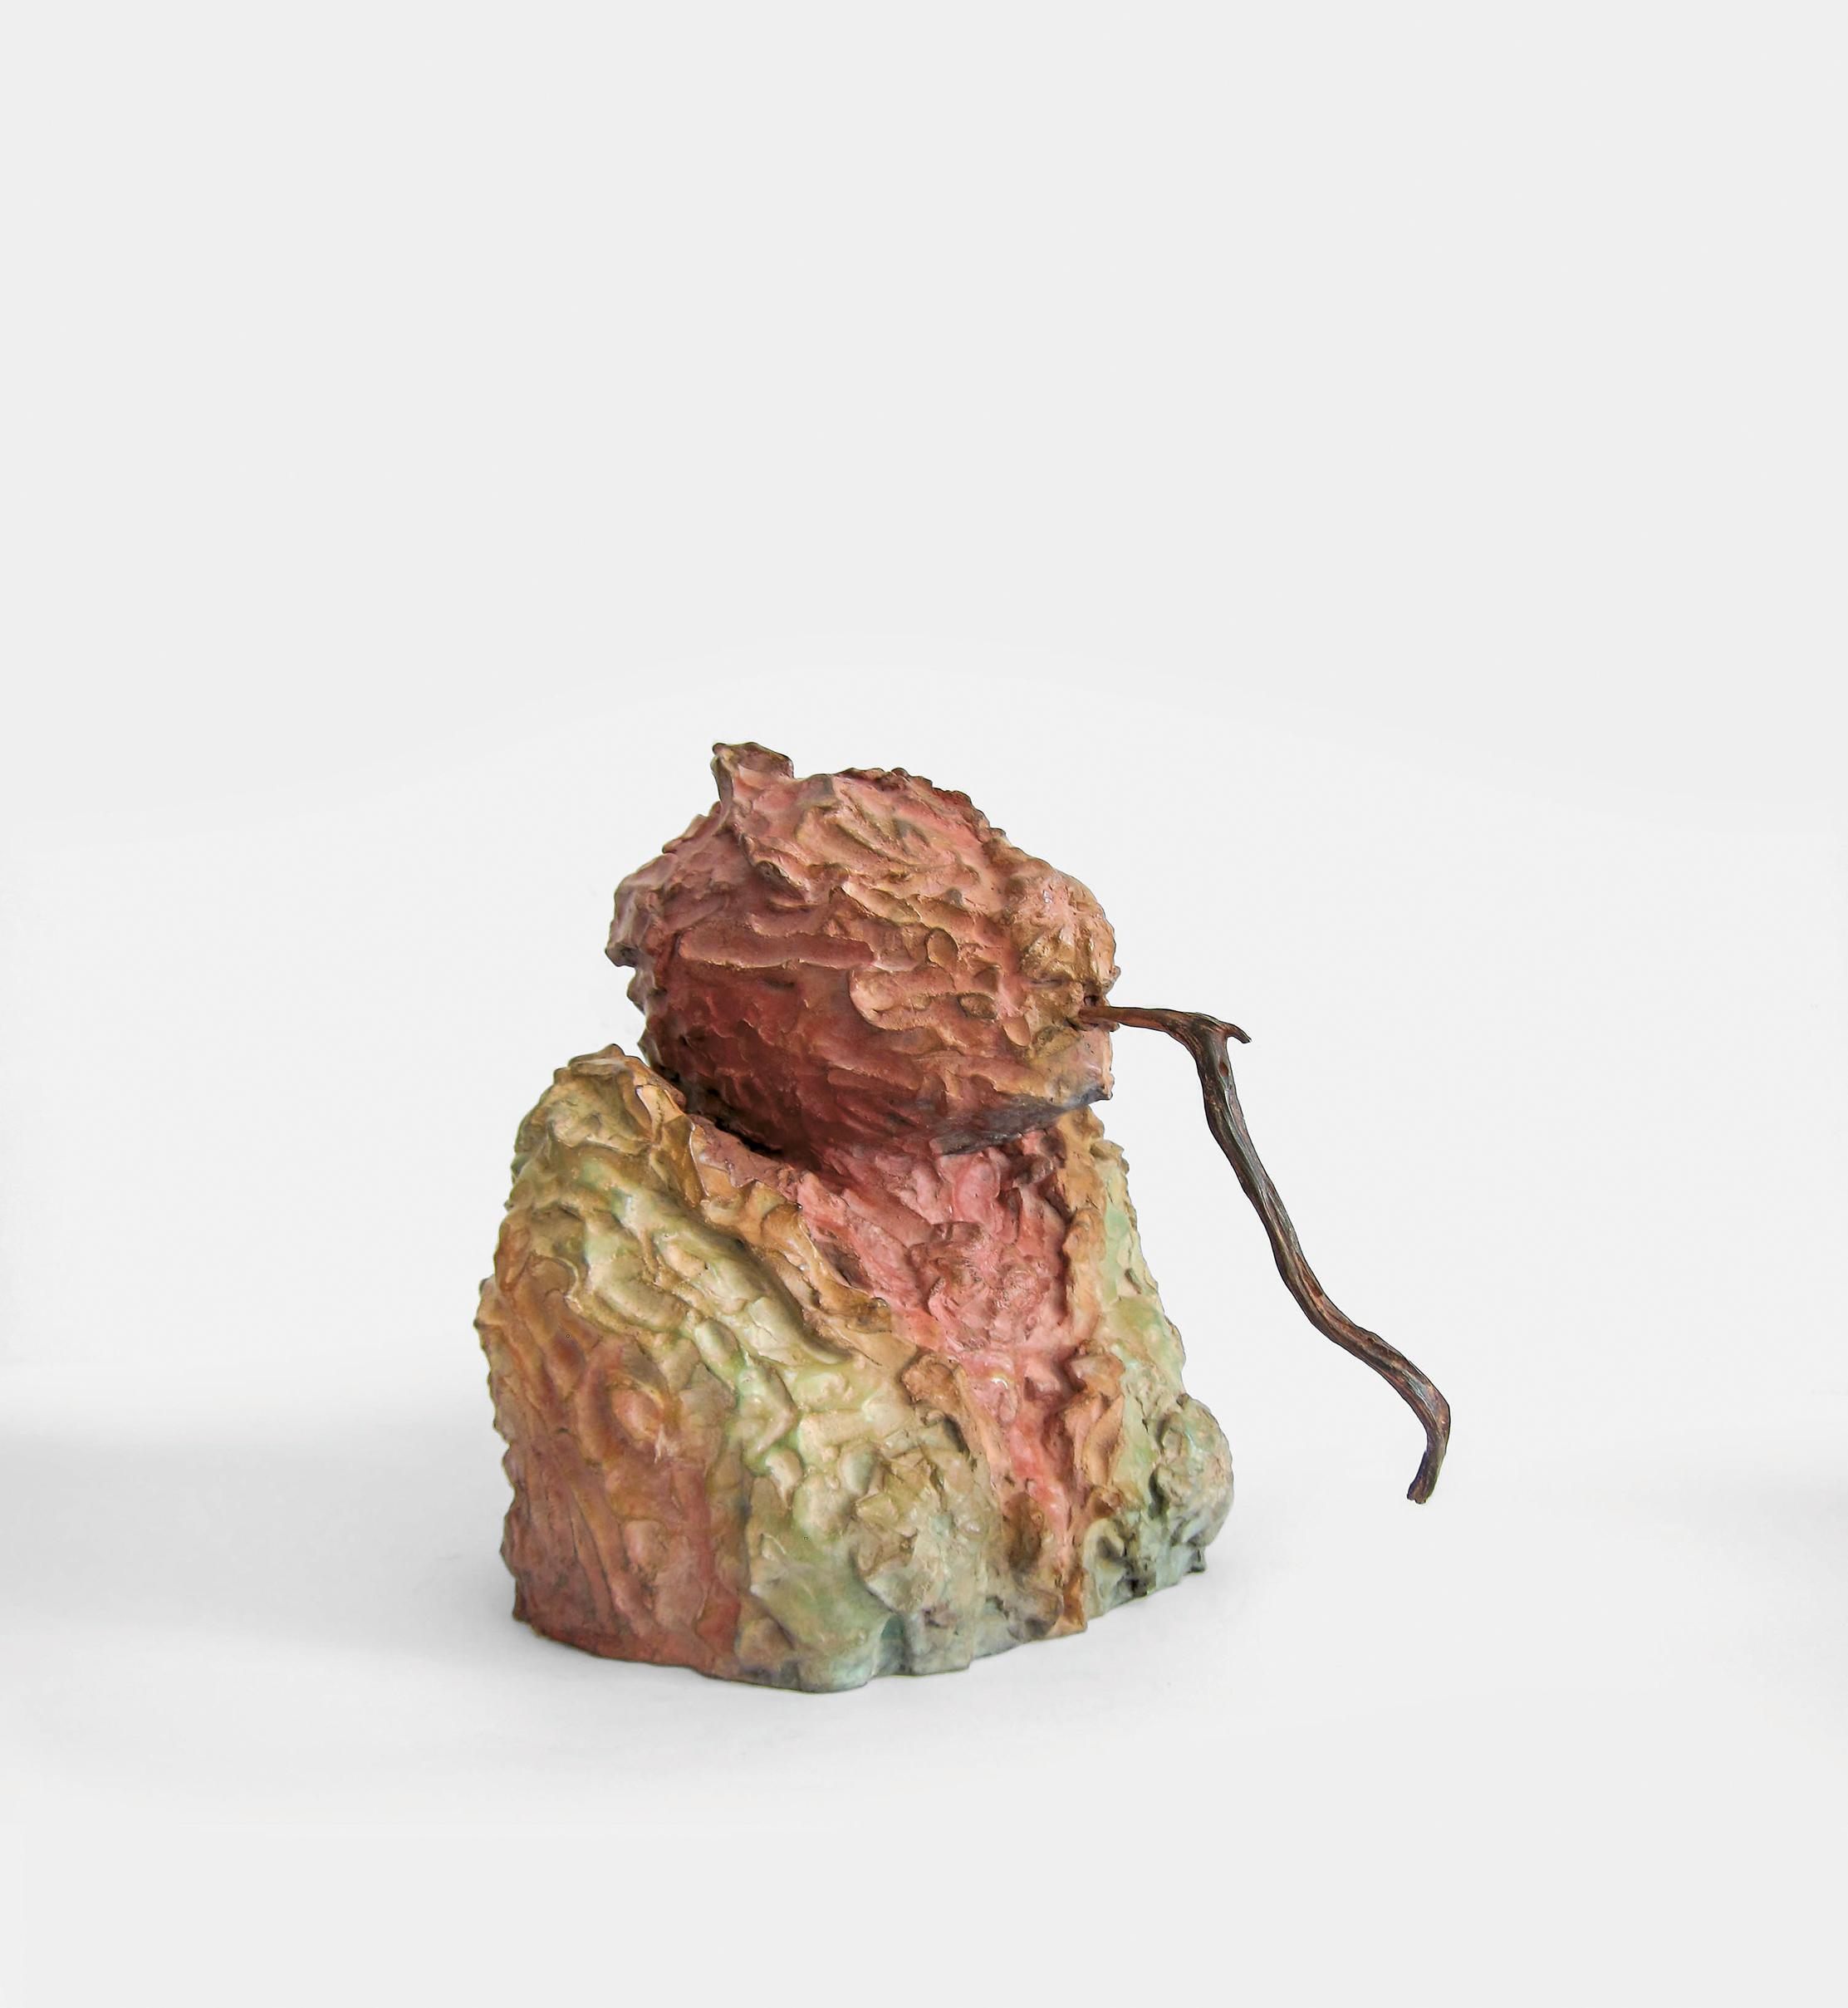 sein (mit Stock),  2009, bronze, 39 × 39 × 42 cm (15.35 × 15.35 × 16.53 in) © Jonny Star, Photo: Jonny Star